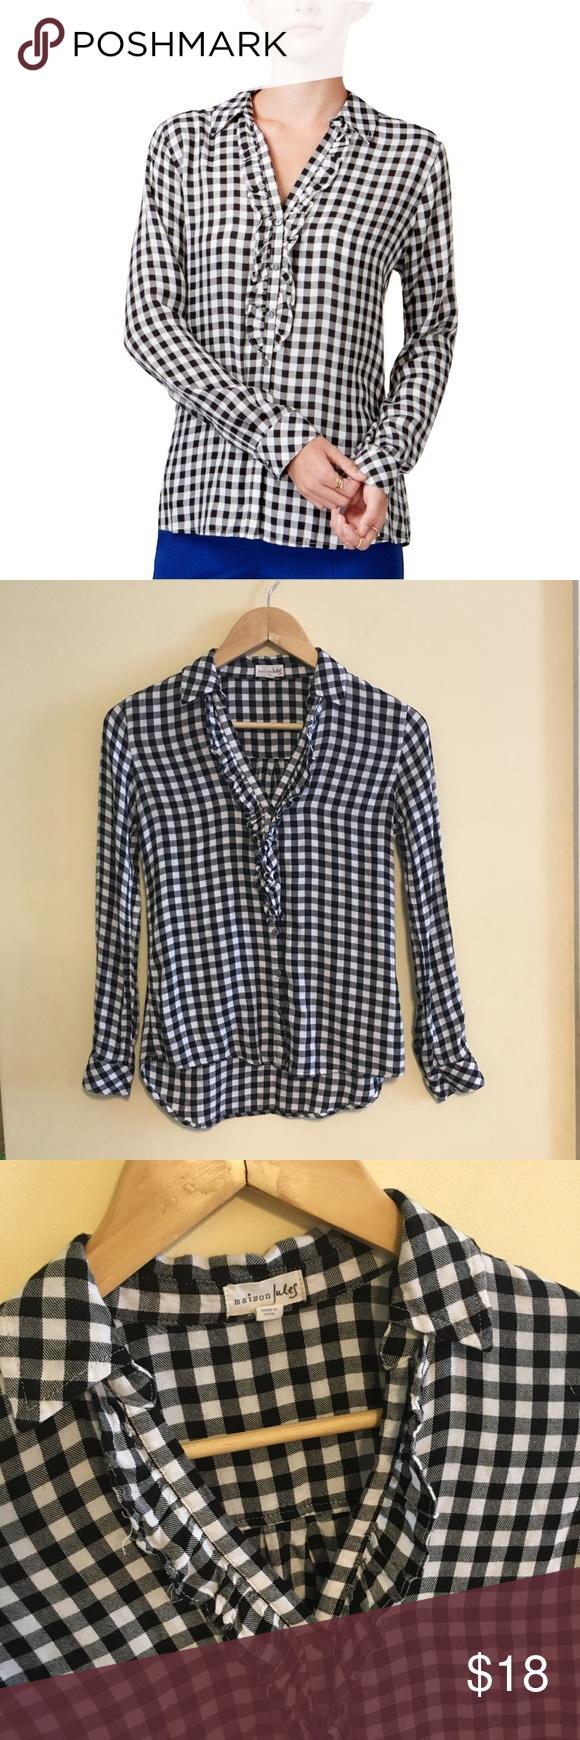 Flannel shirt xs  XS Maison Jules Black u White Check Flannel Shirt  My Posh Picks